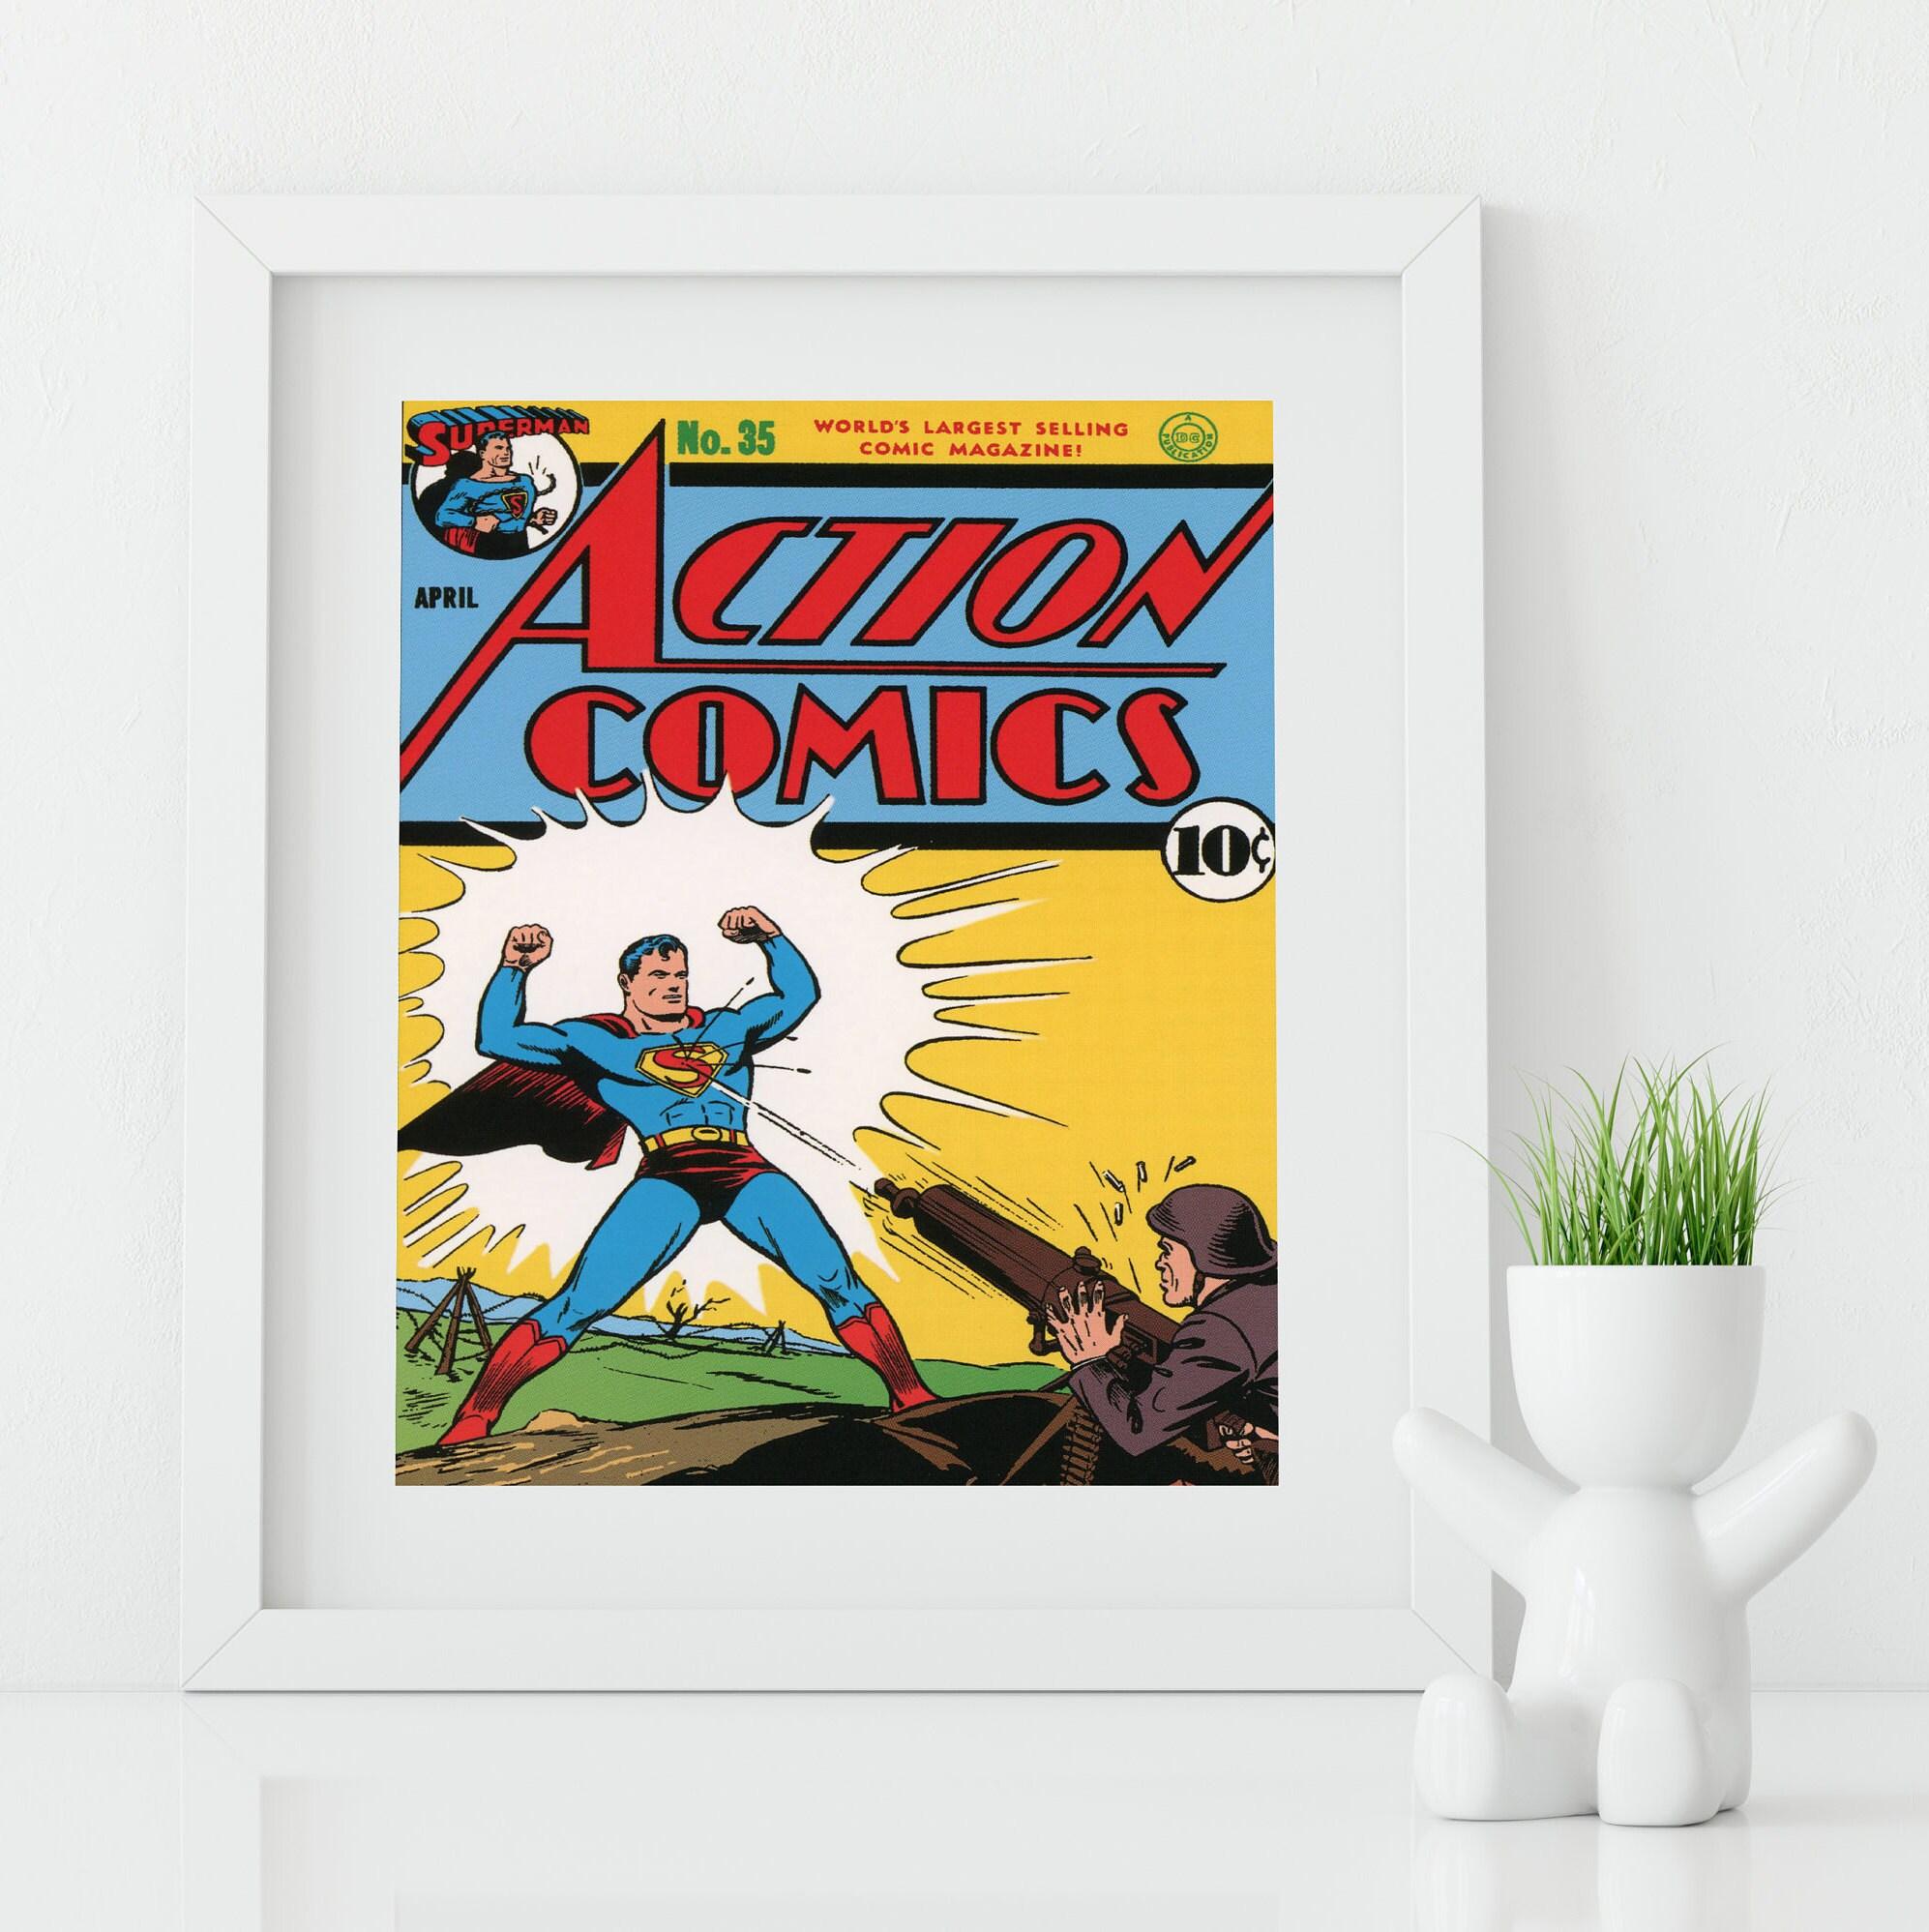 Superhero Wall Art / Superman Poster / Action Comics Art / Vintage Comic  Book / Nerd Gift / Geeky Wall Art / Superman Art / Geeky Baby Gift